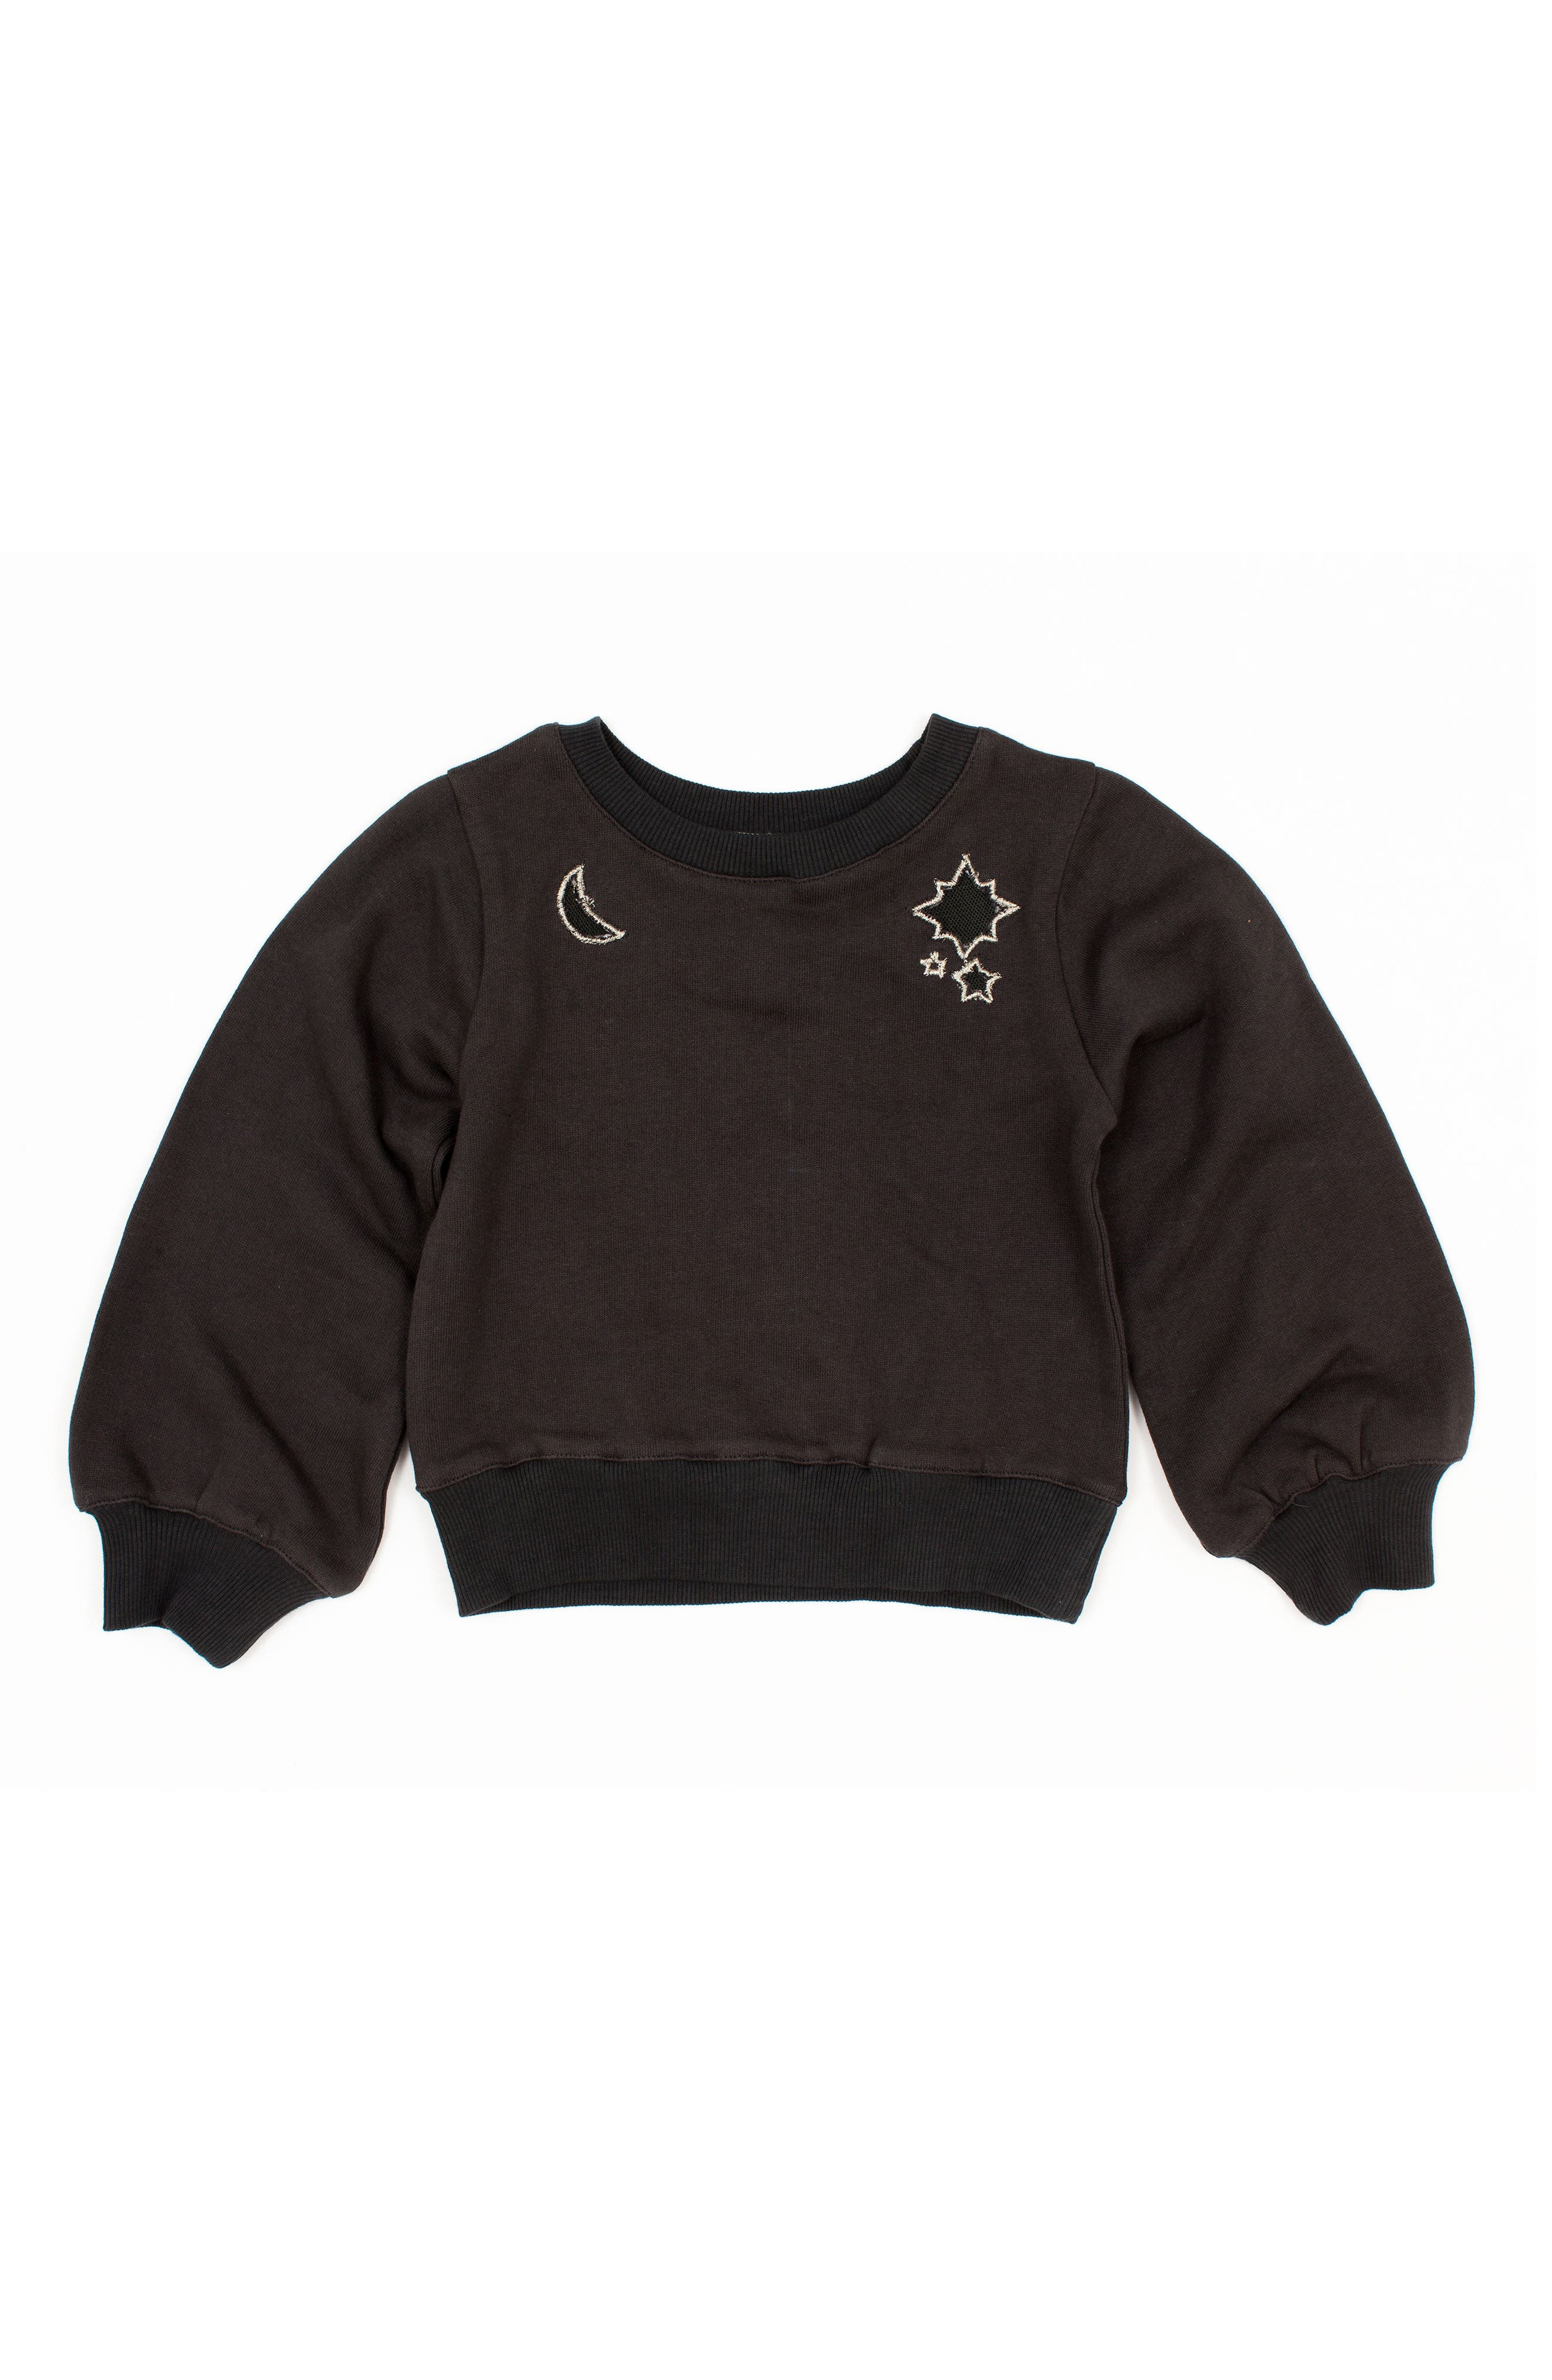 Alchemy Sweatshirt,                         Main,                         color, TITANIUM